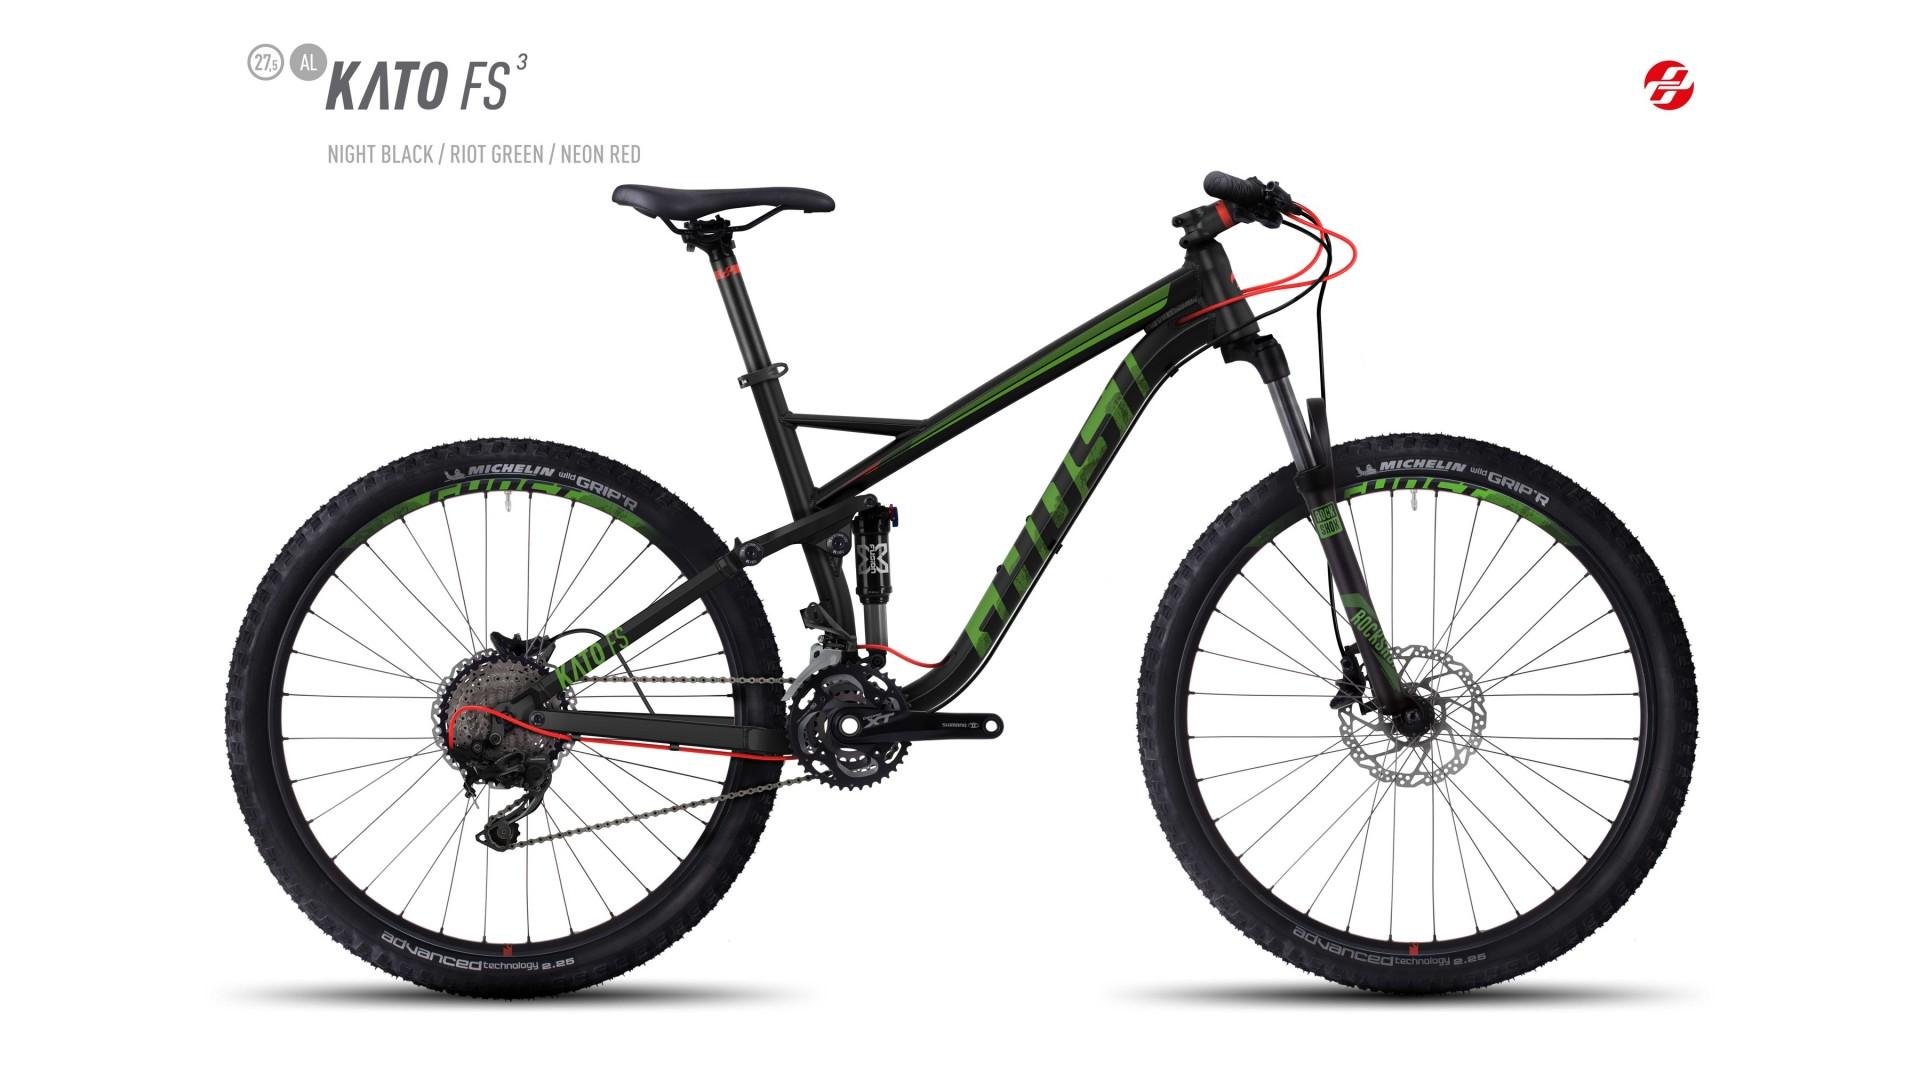 Велосипед GHOST Kato FS 3 AL 27.5 nightblack/riotgreen/neonred год 2017